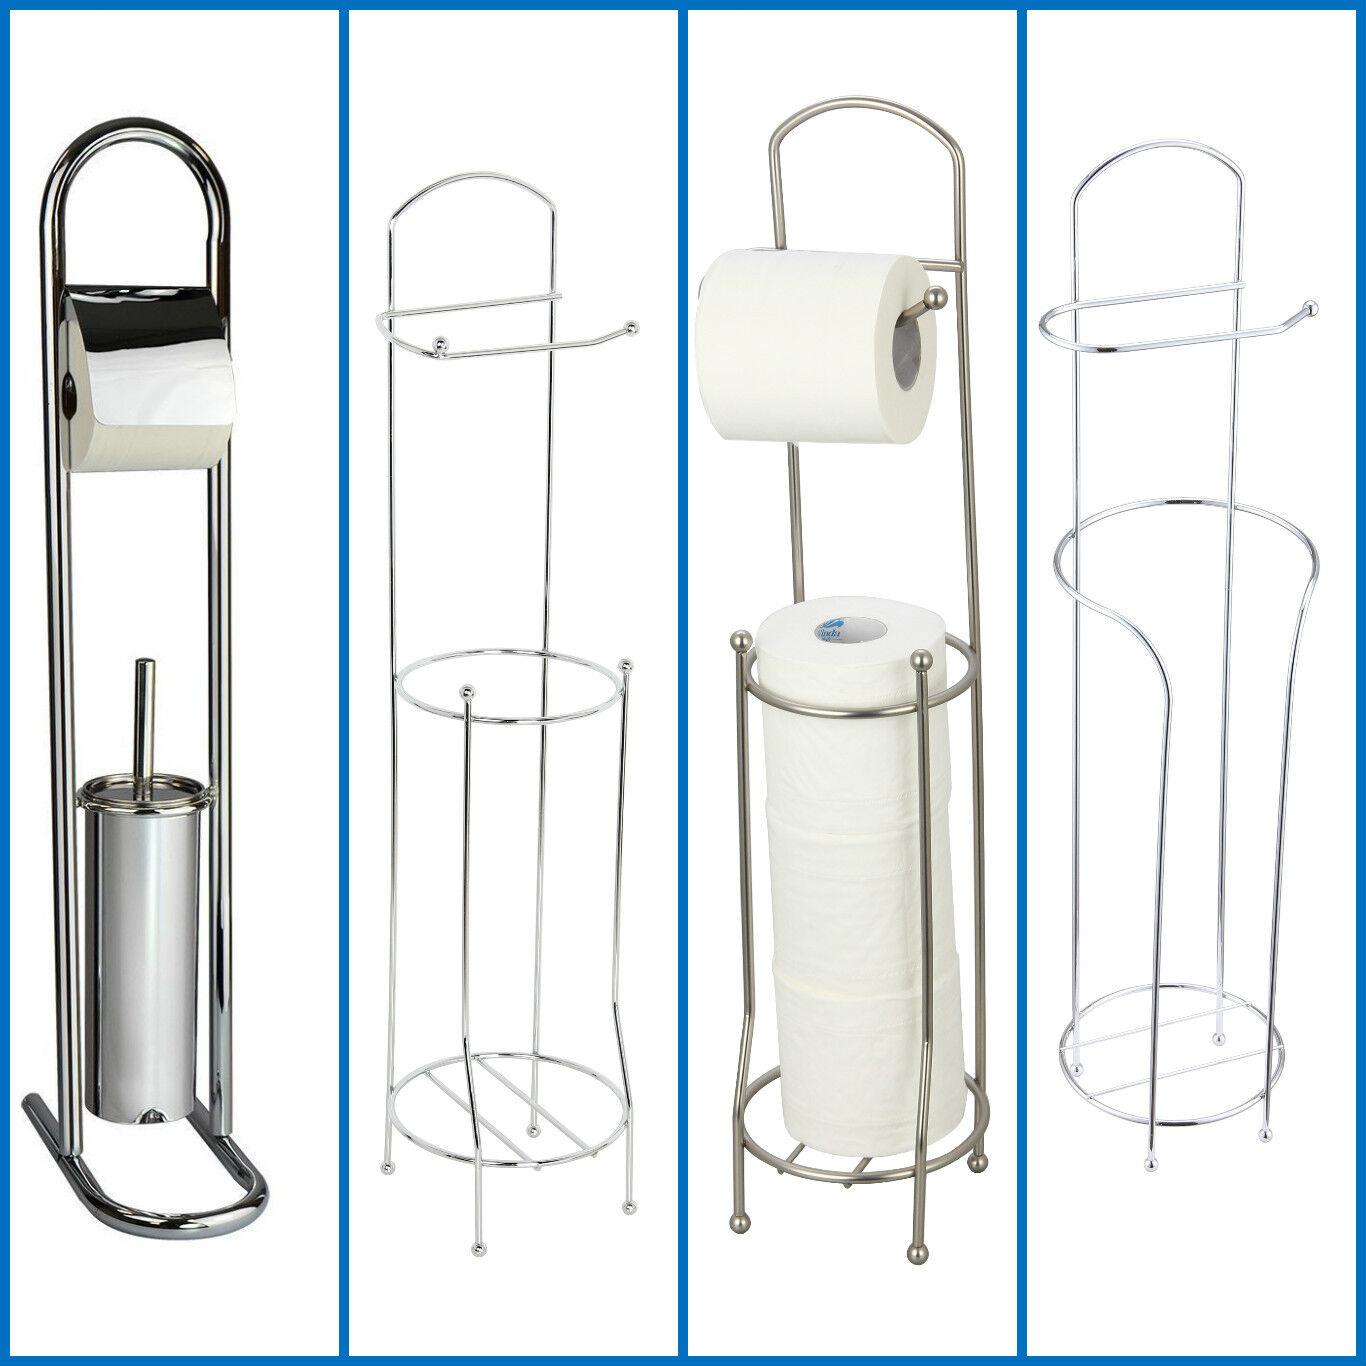 Free standing toilet bathroom chrome tissue paper roll - Bathroom toilet paper holder free standing ...